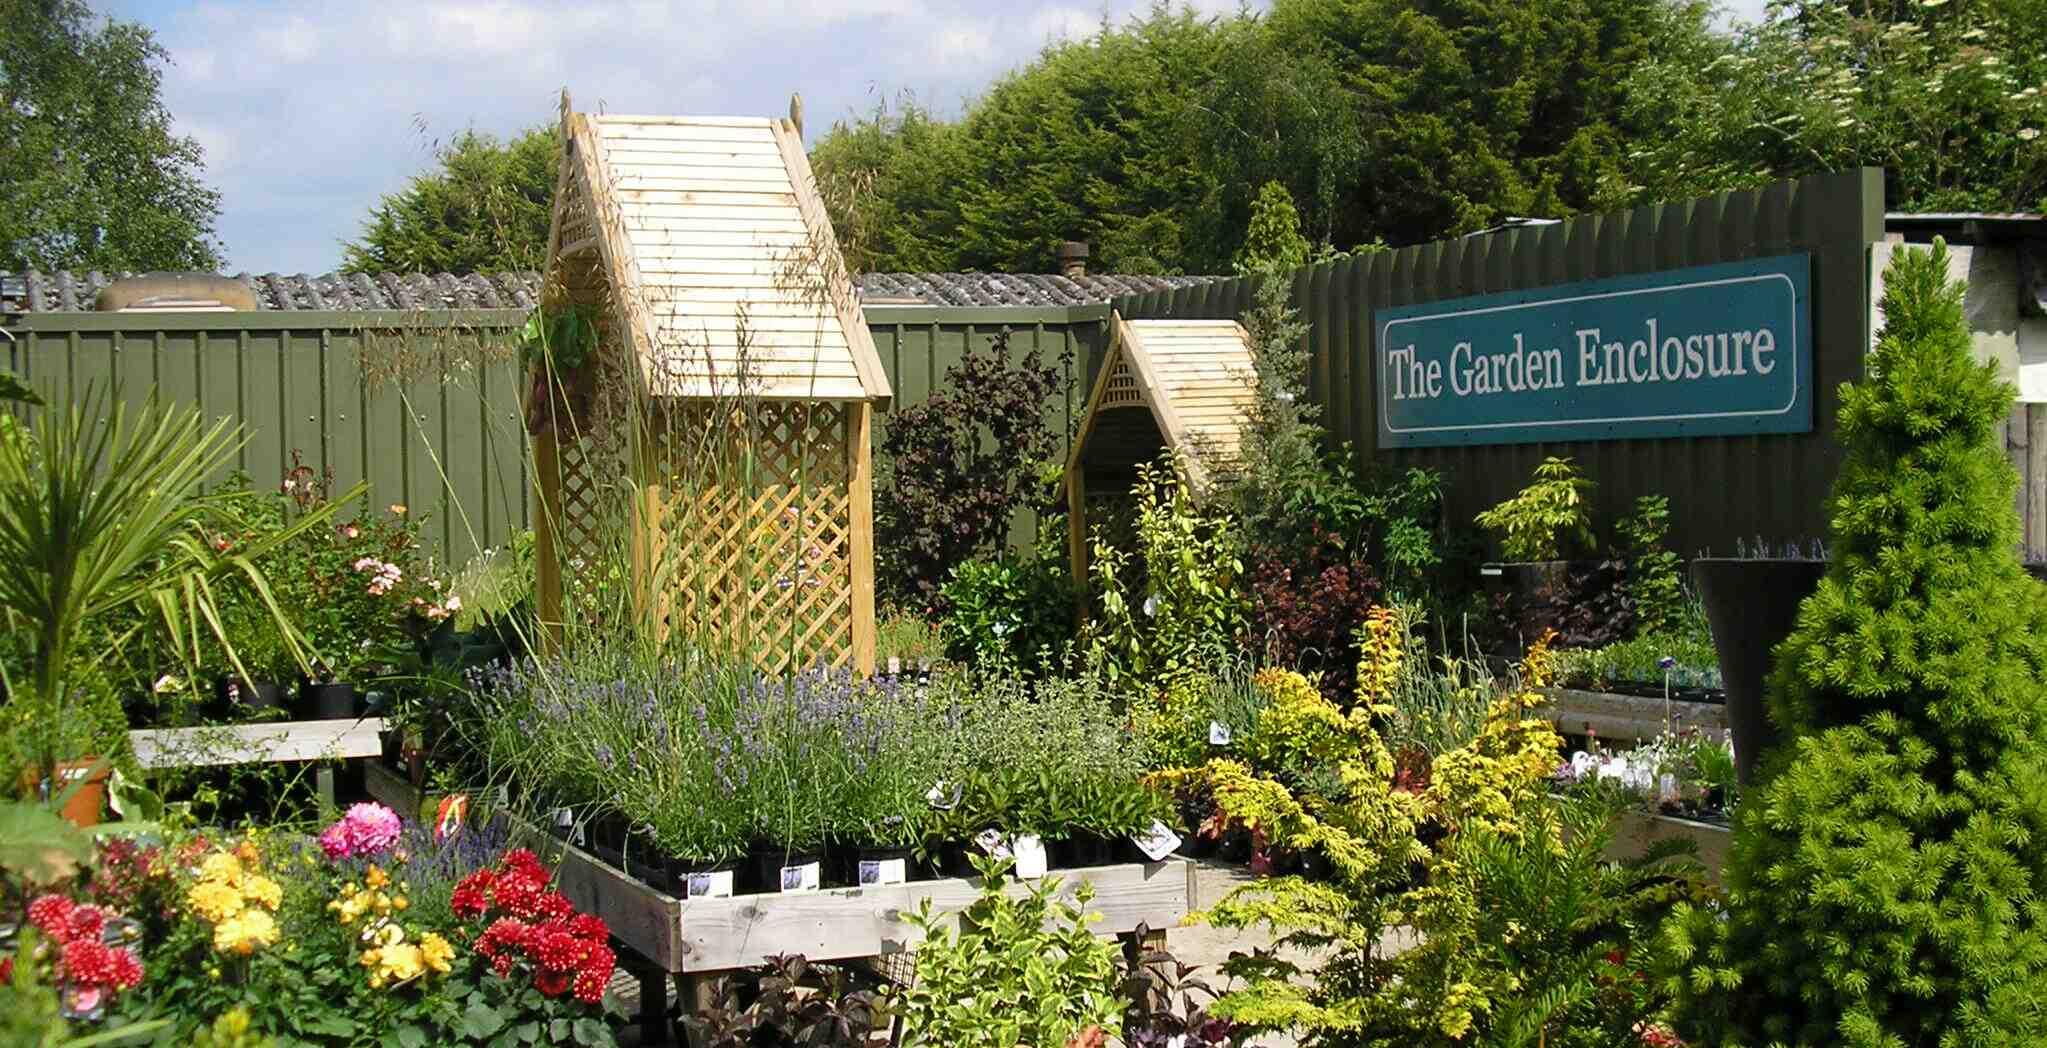 Visit Us For Plants, Pots, Tools, Gardening Sundries, Composts, Stone  Ornaments U0026 Bird Baths, Timber Products, Rockery Stones U0026 Gravels, Garden  Wildlife ...